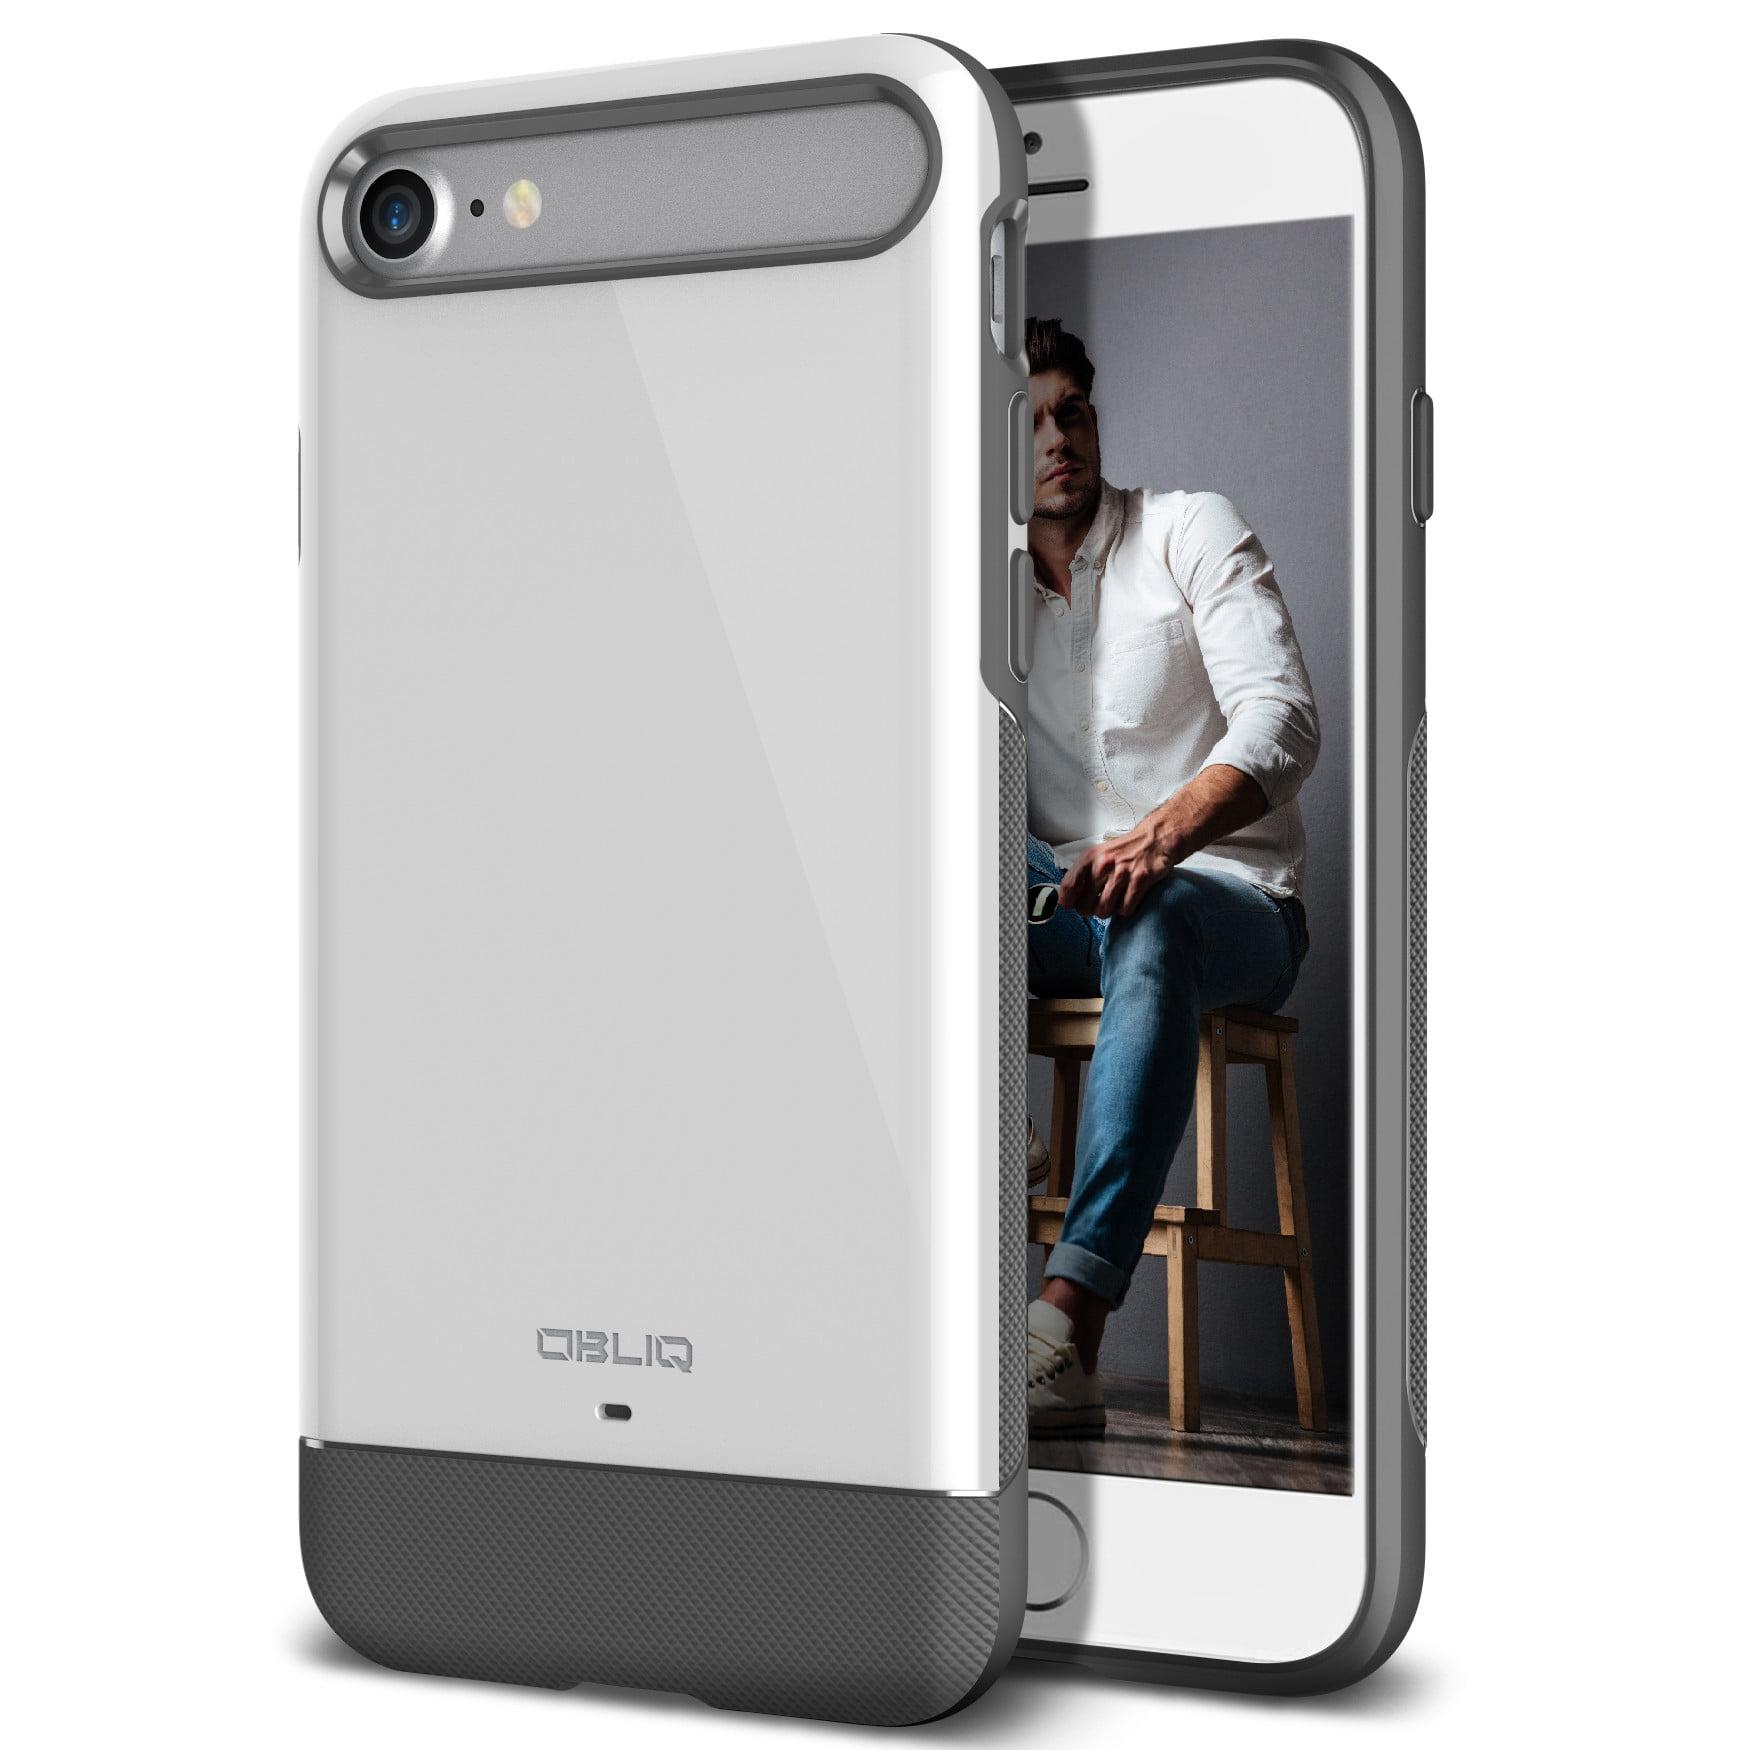 iPhone 7 Case, OBLIQ [Dual Meta][Jet Black] - Protective Slim Dual Composite Vibrant Luxury & Enhanced Grip Form Fitting Style Case for Apple iPhone 7 (2016)